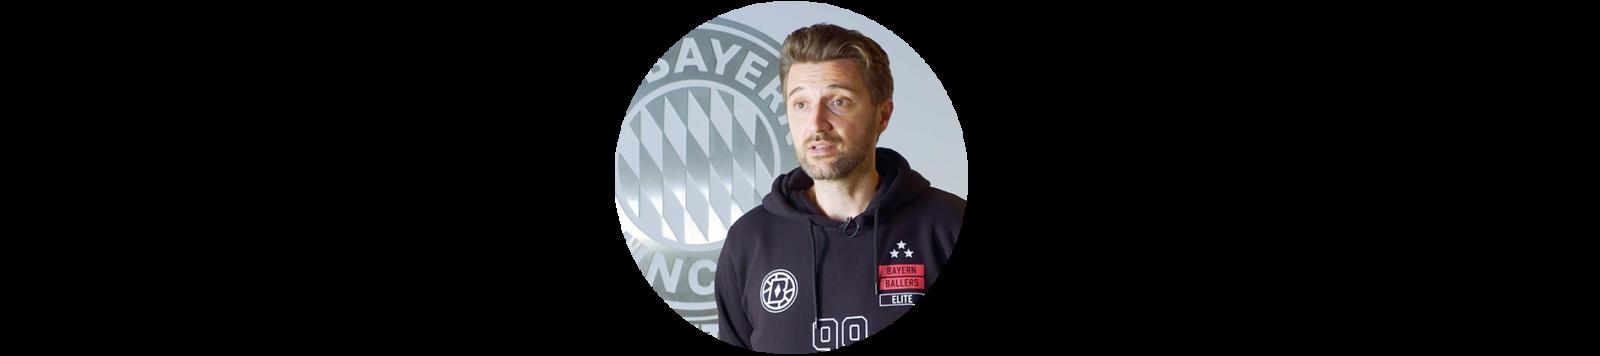 Marko Persic Bayern Basketball Website